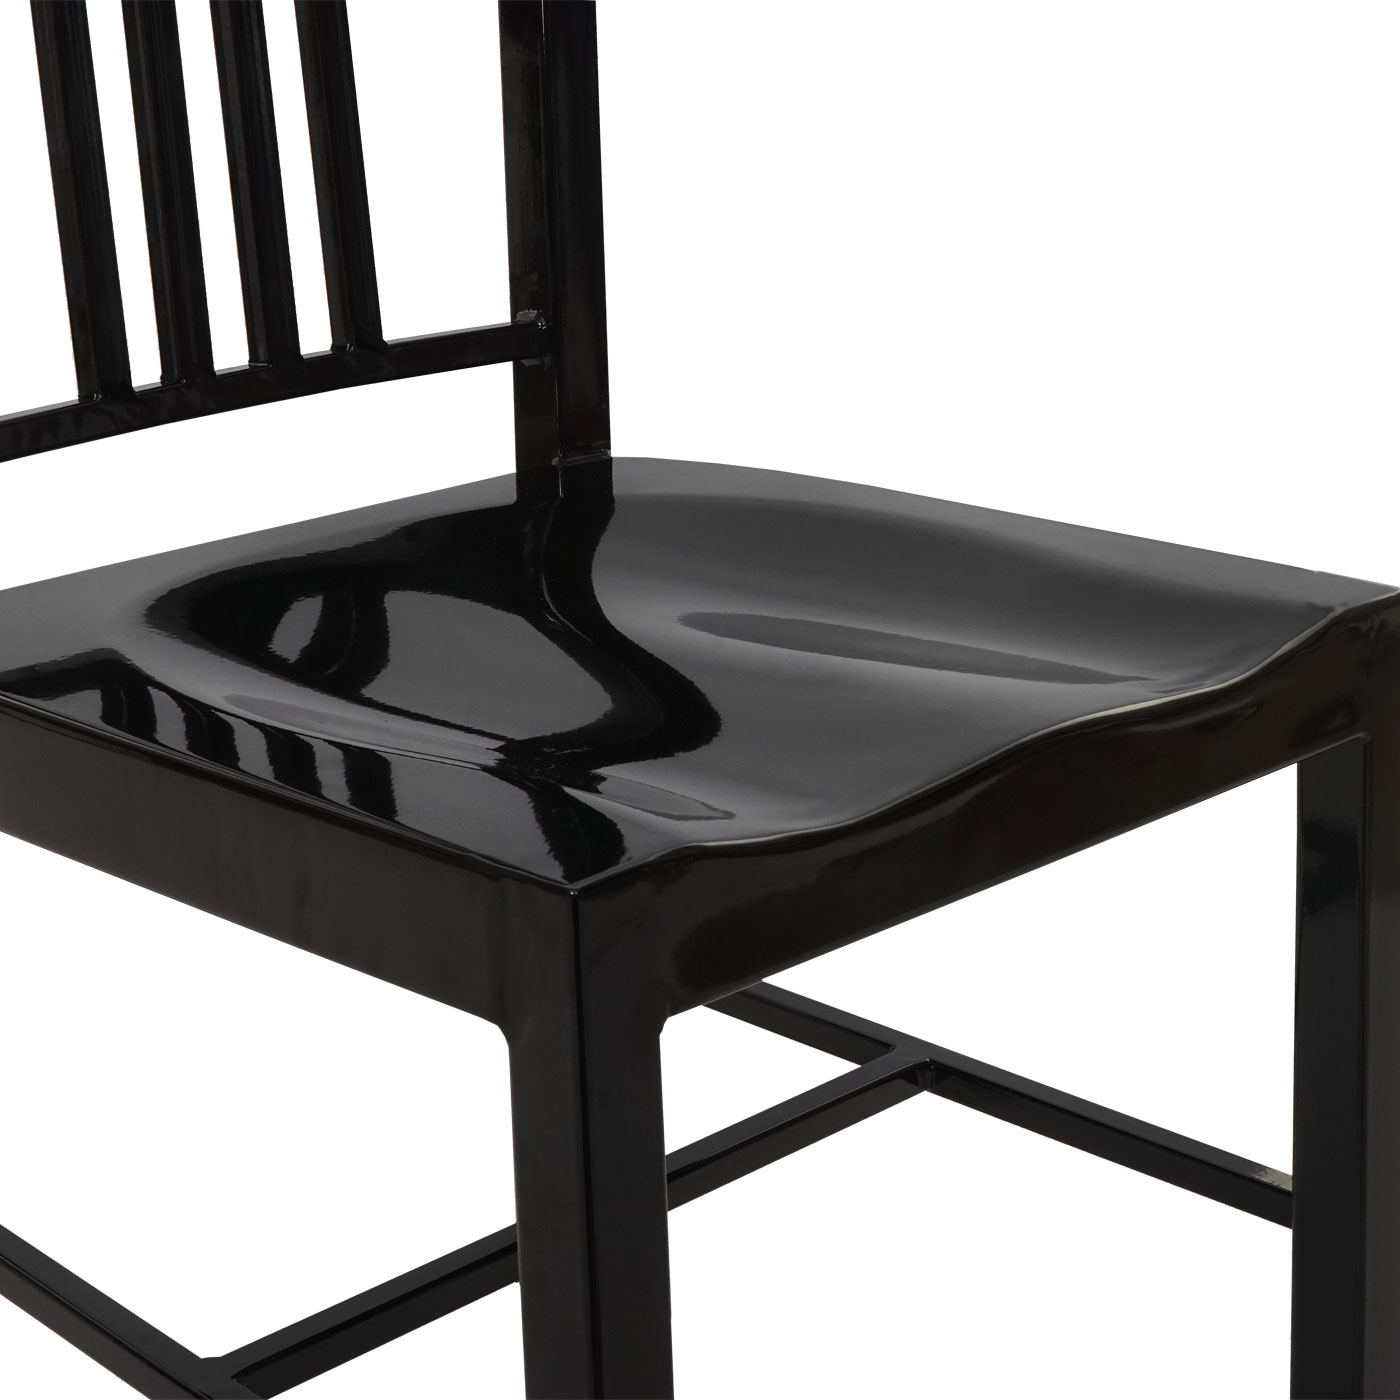 2x esszimmerstuhl mcw a73 stuhl lehnstuhl metall for Esszimmerstuhl metall